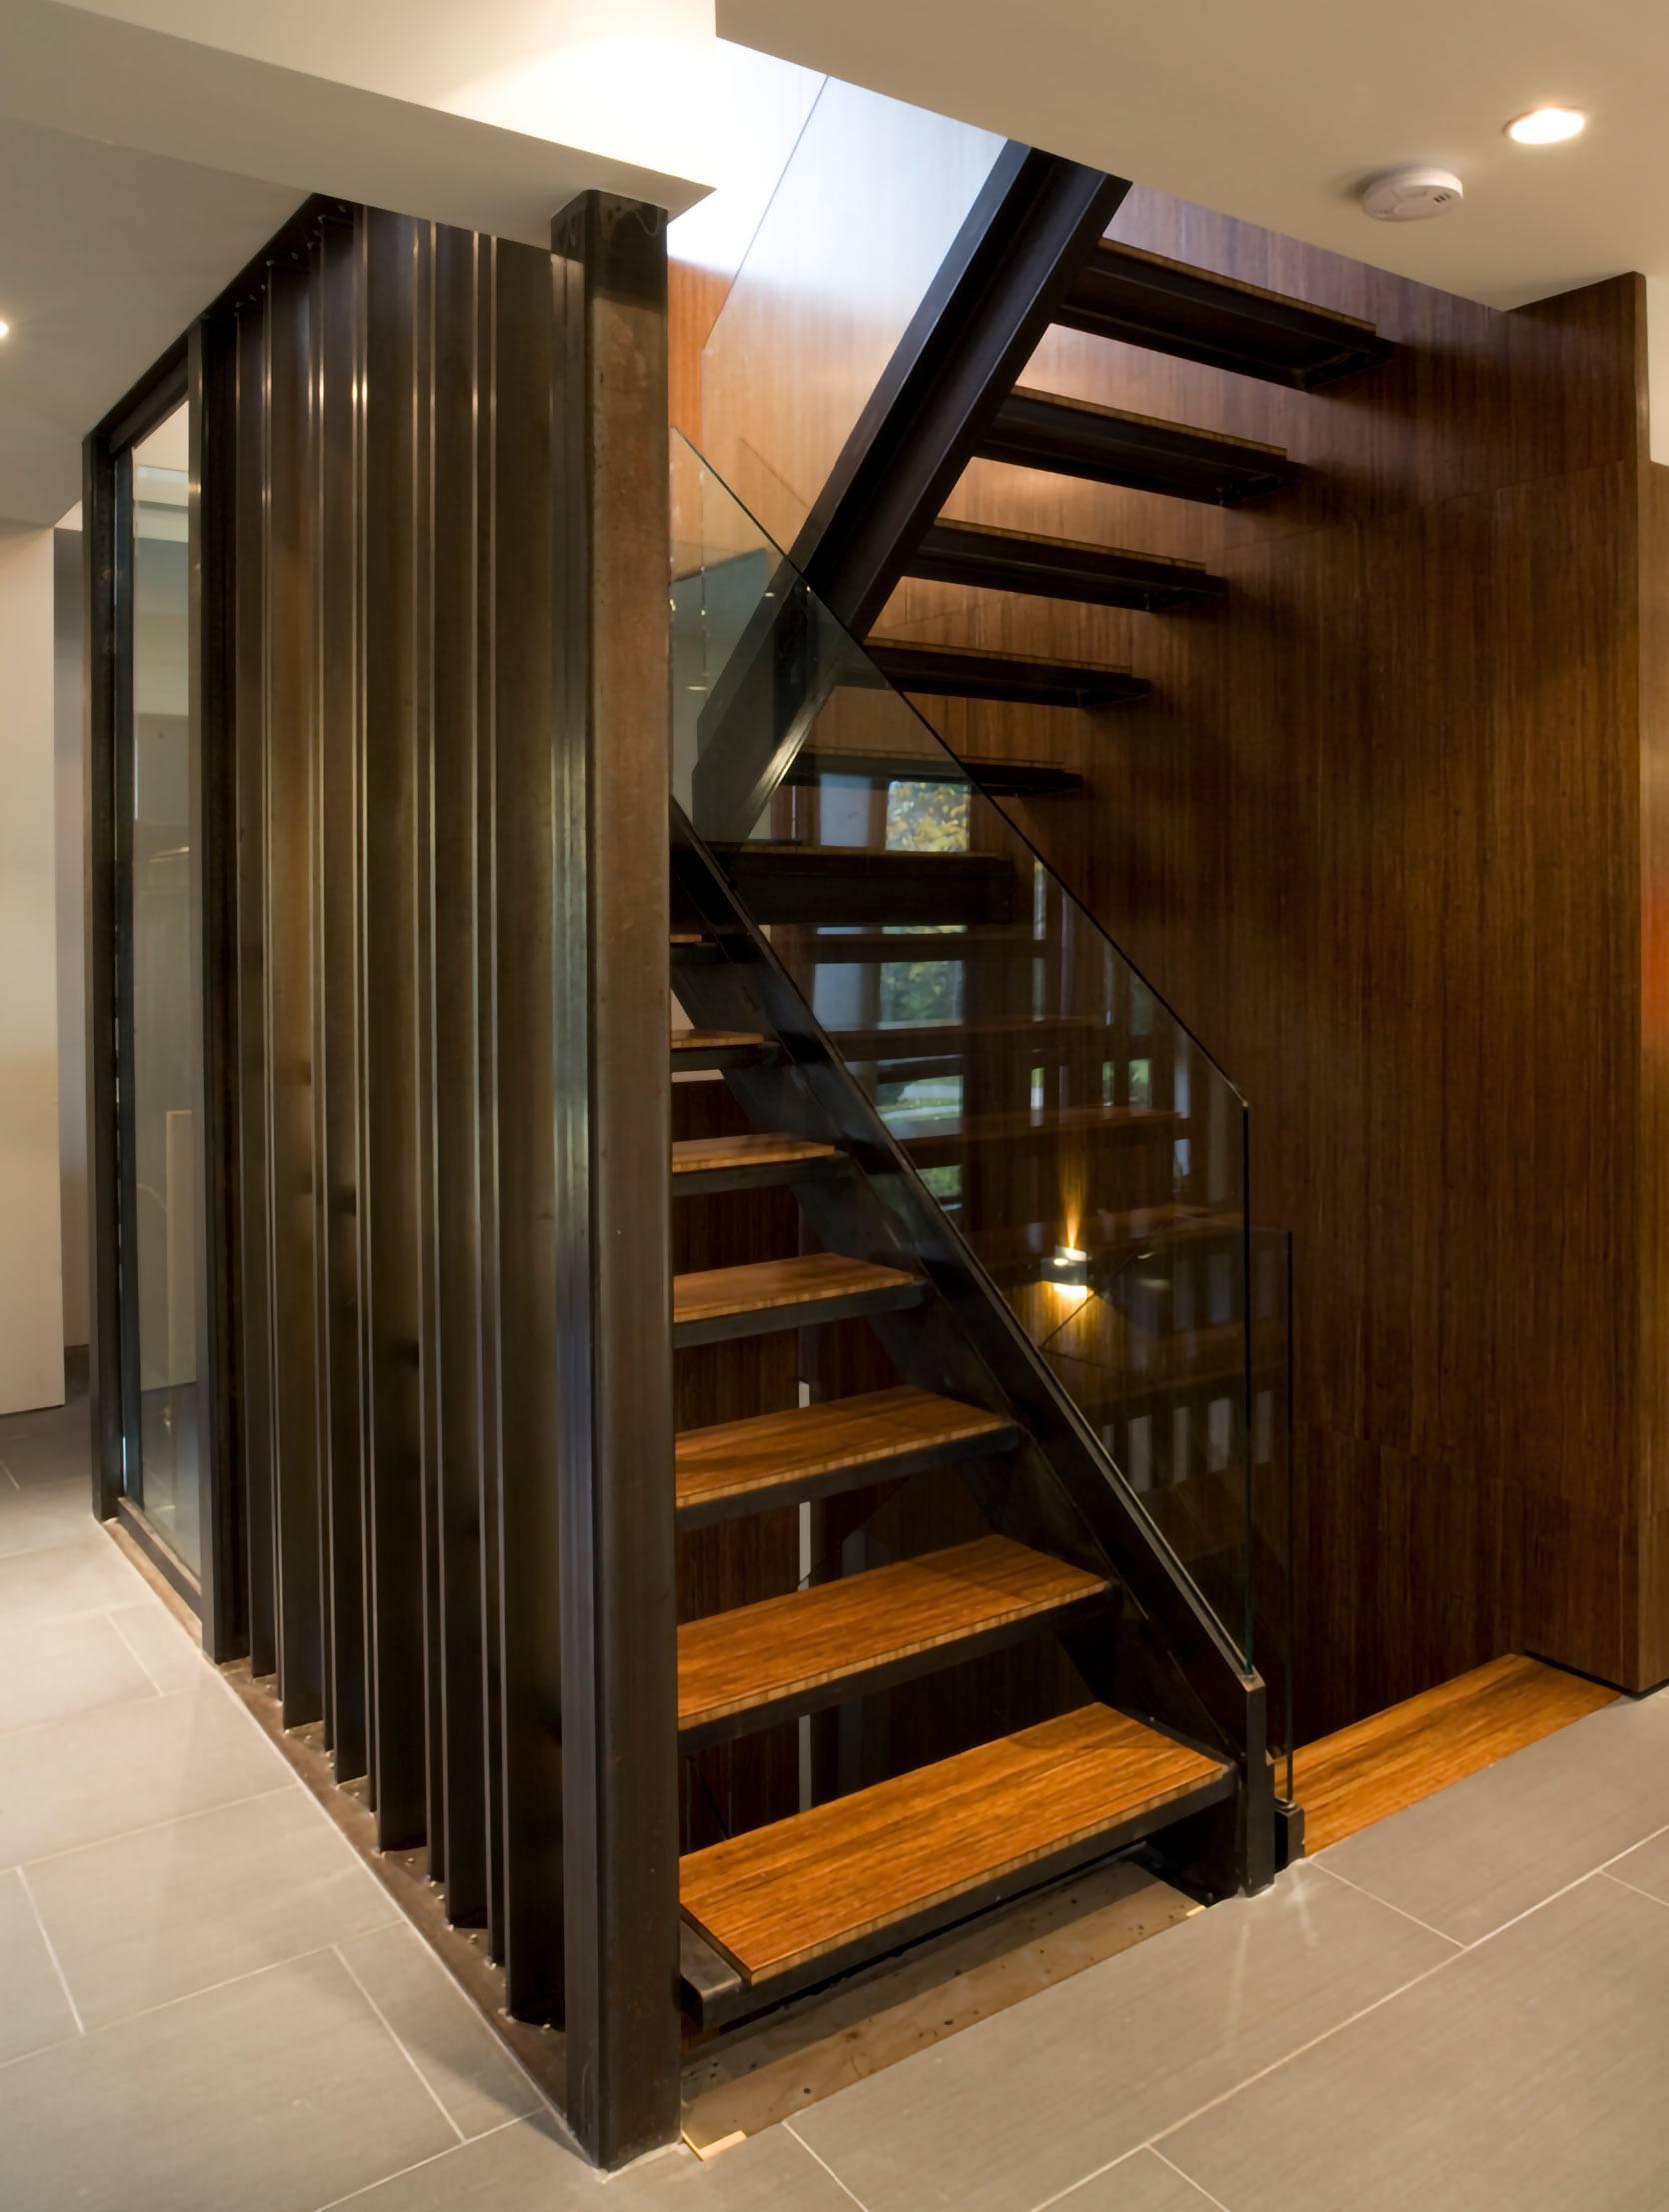 north-york-house-staircase-interior